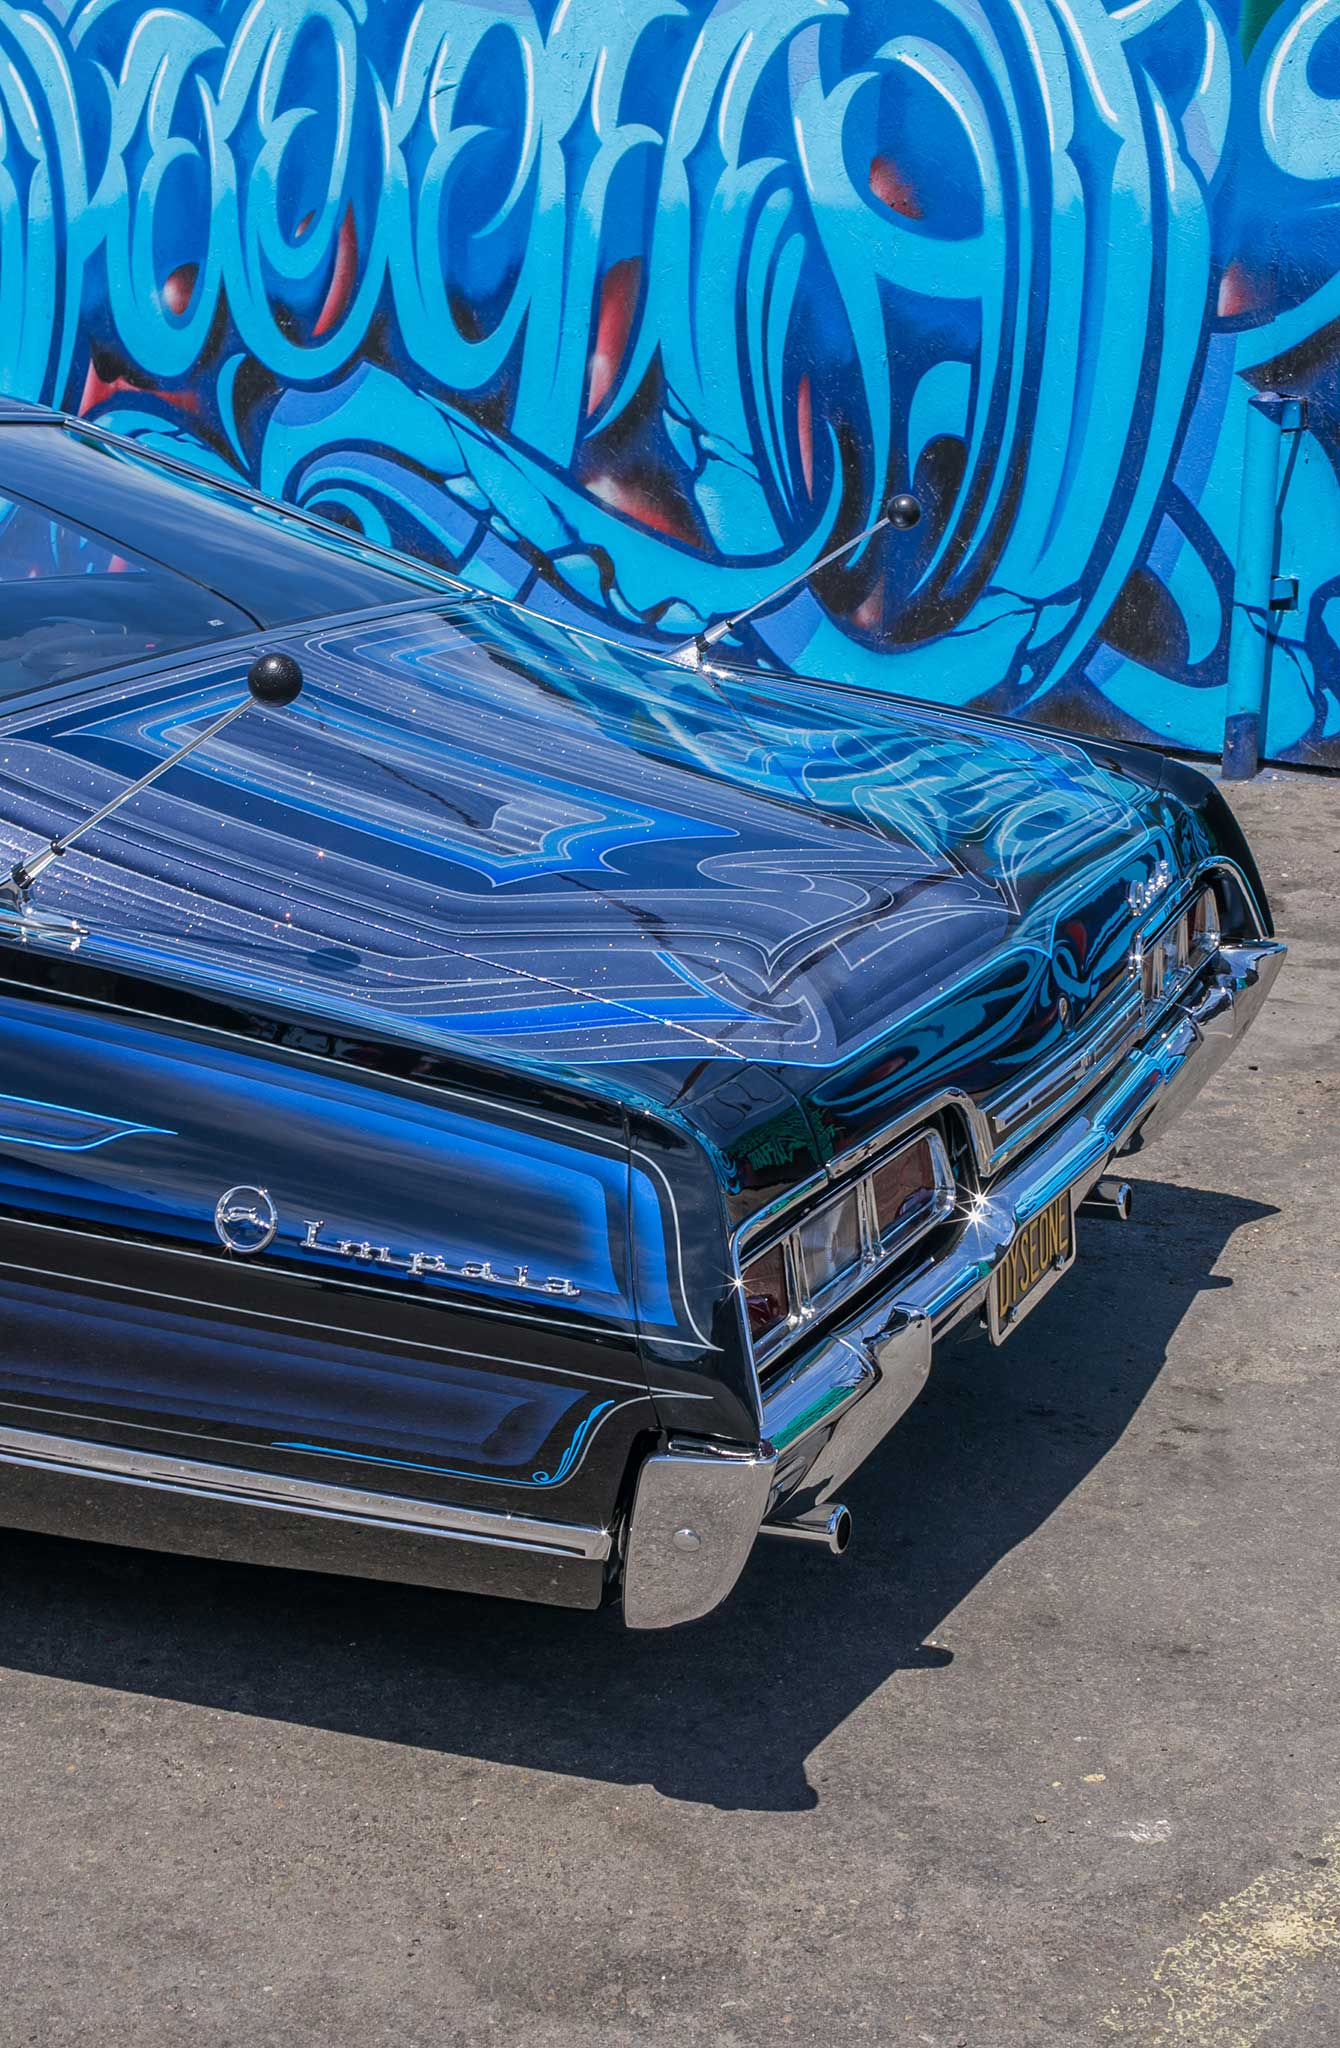 1967 chevrolet impala rear bumper 019